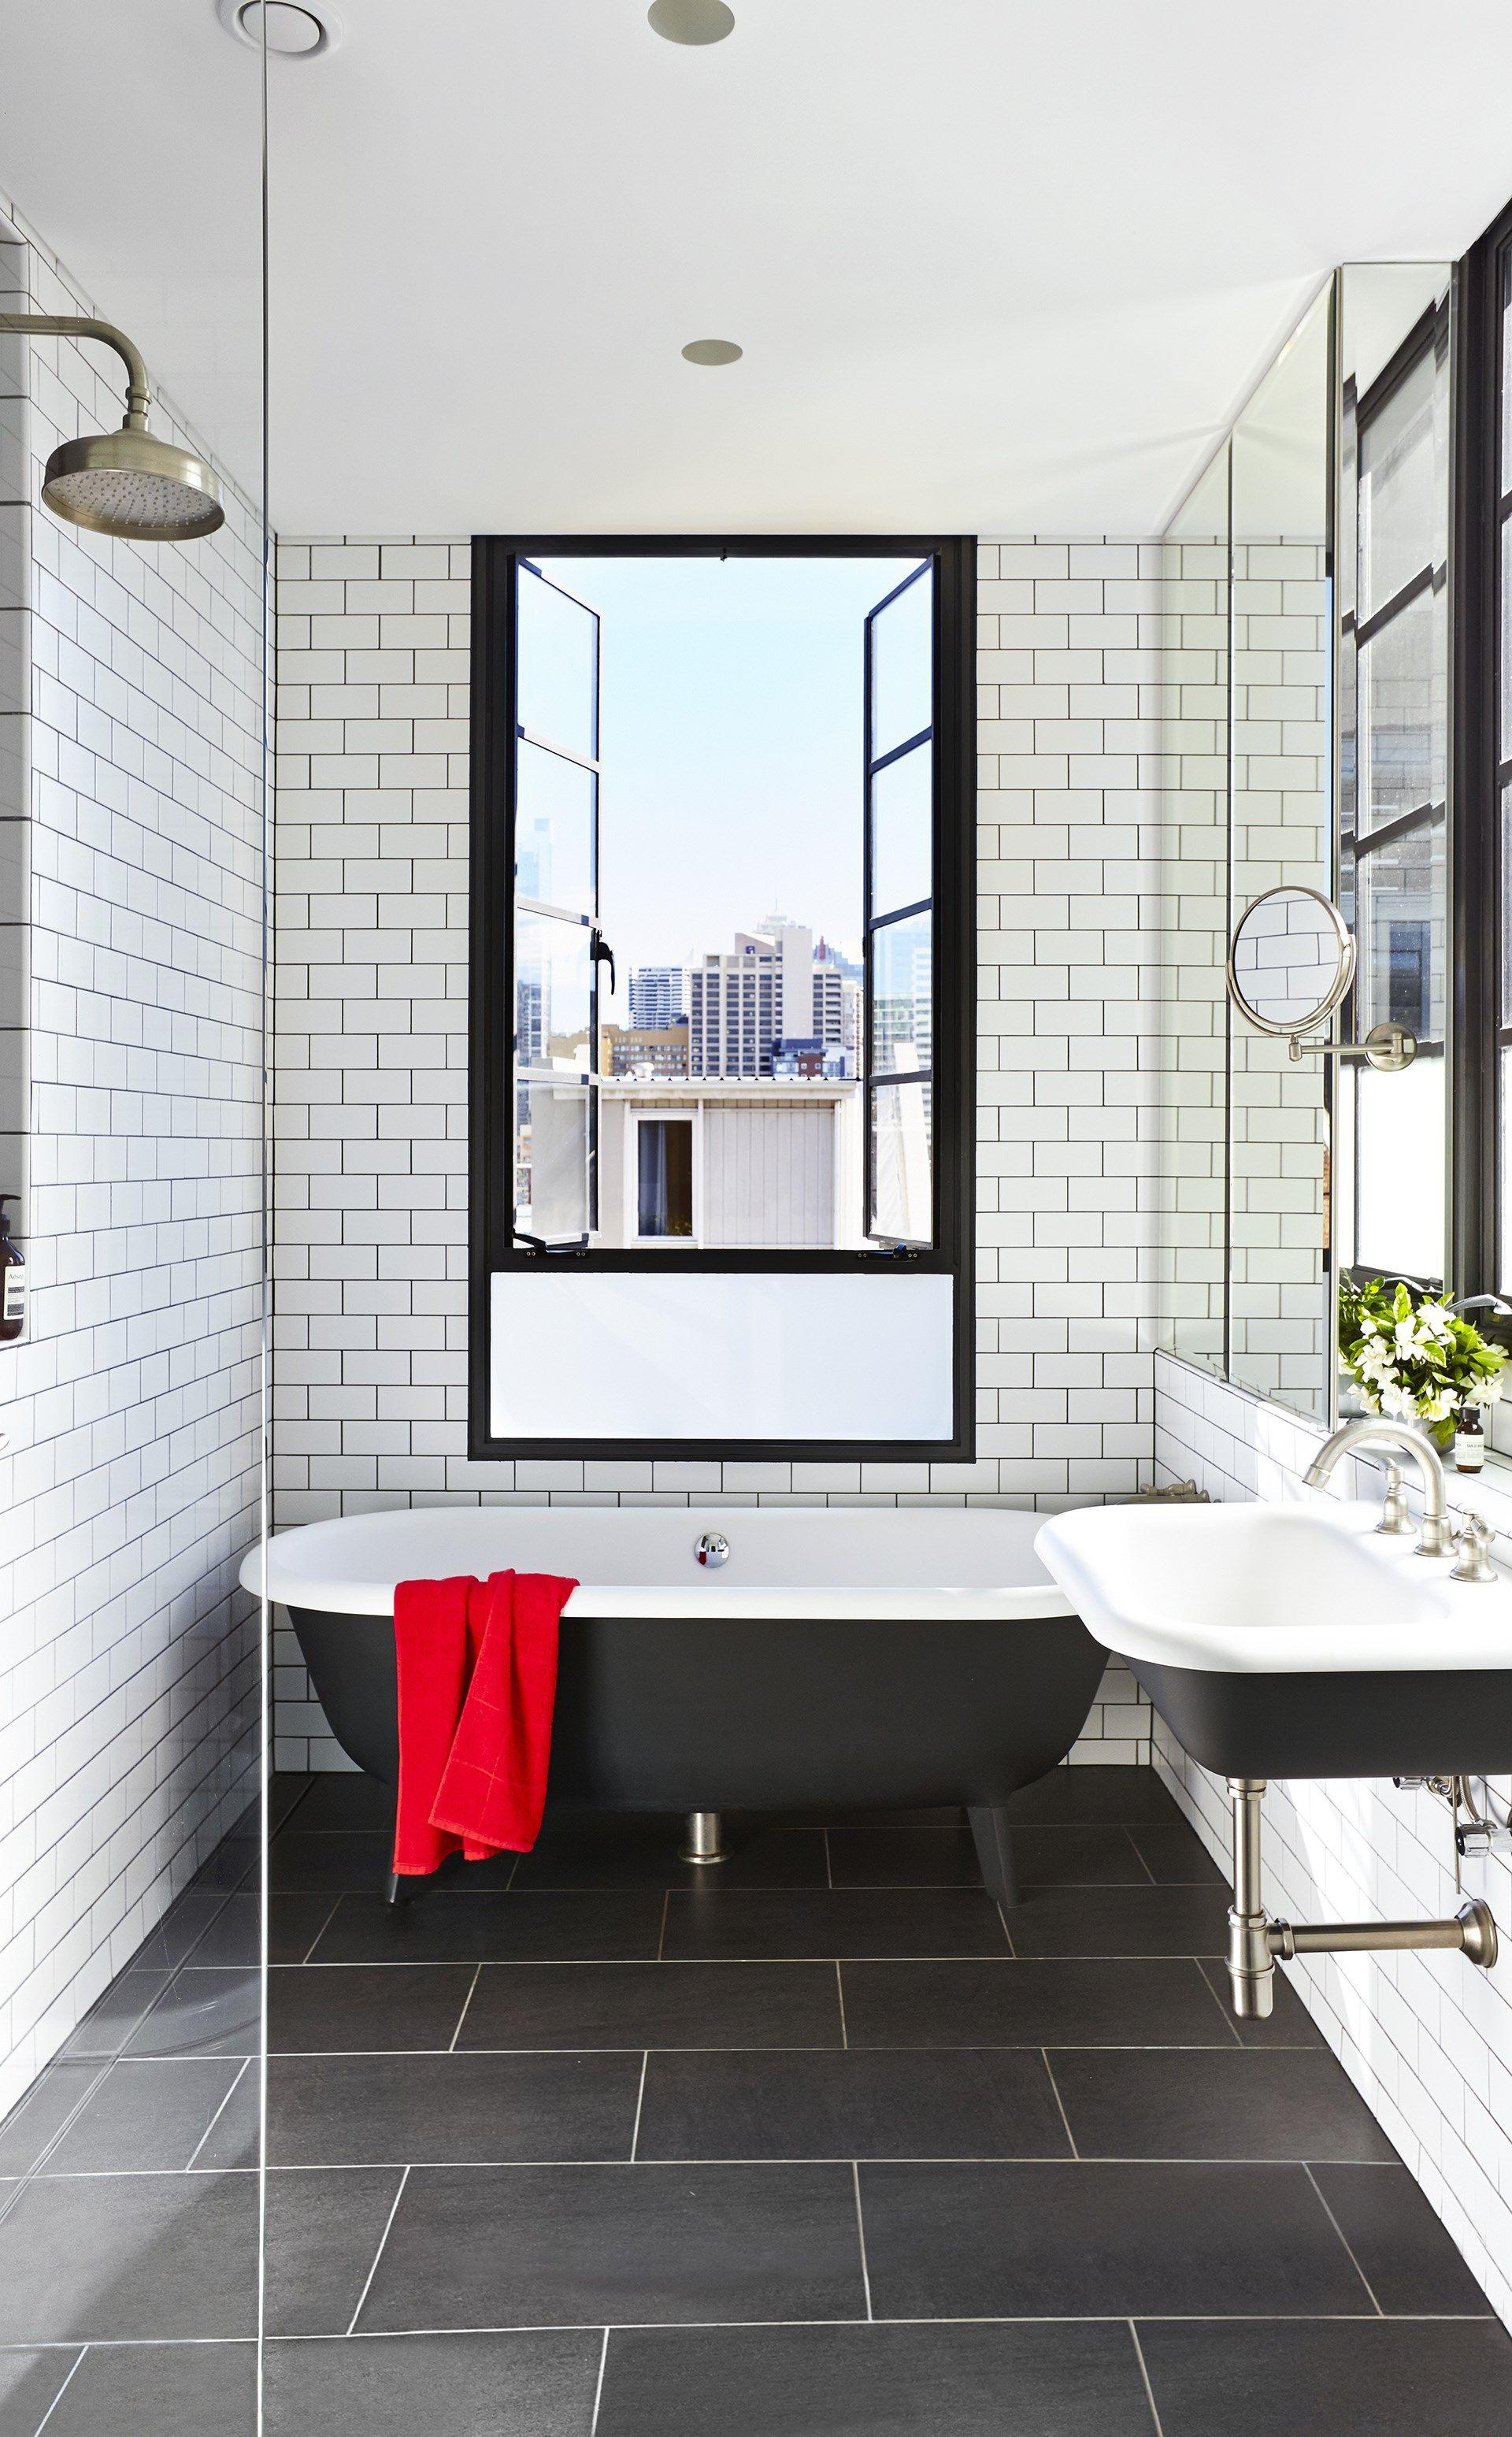 30 Beautiful Bathroom Design Ideas Classic Bathroom White Bathroom Designs Black Bathroom